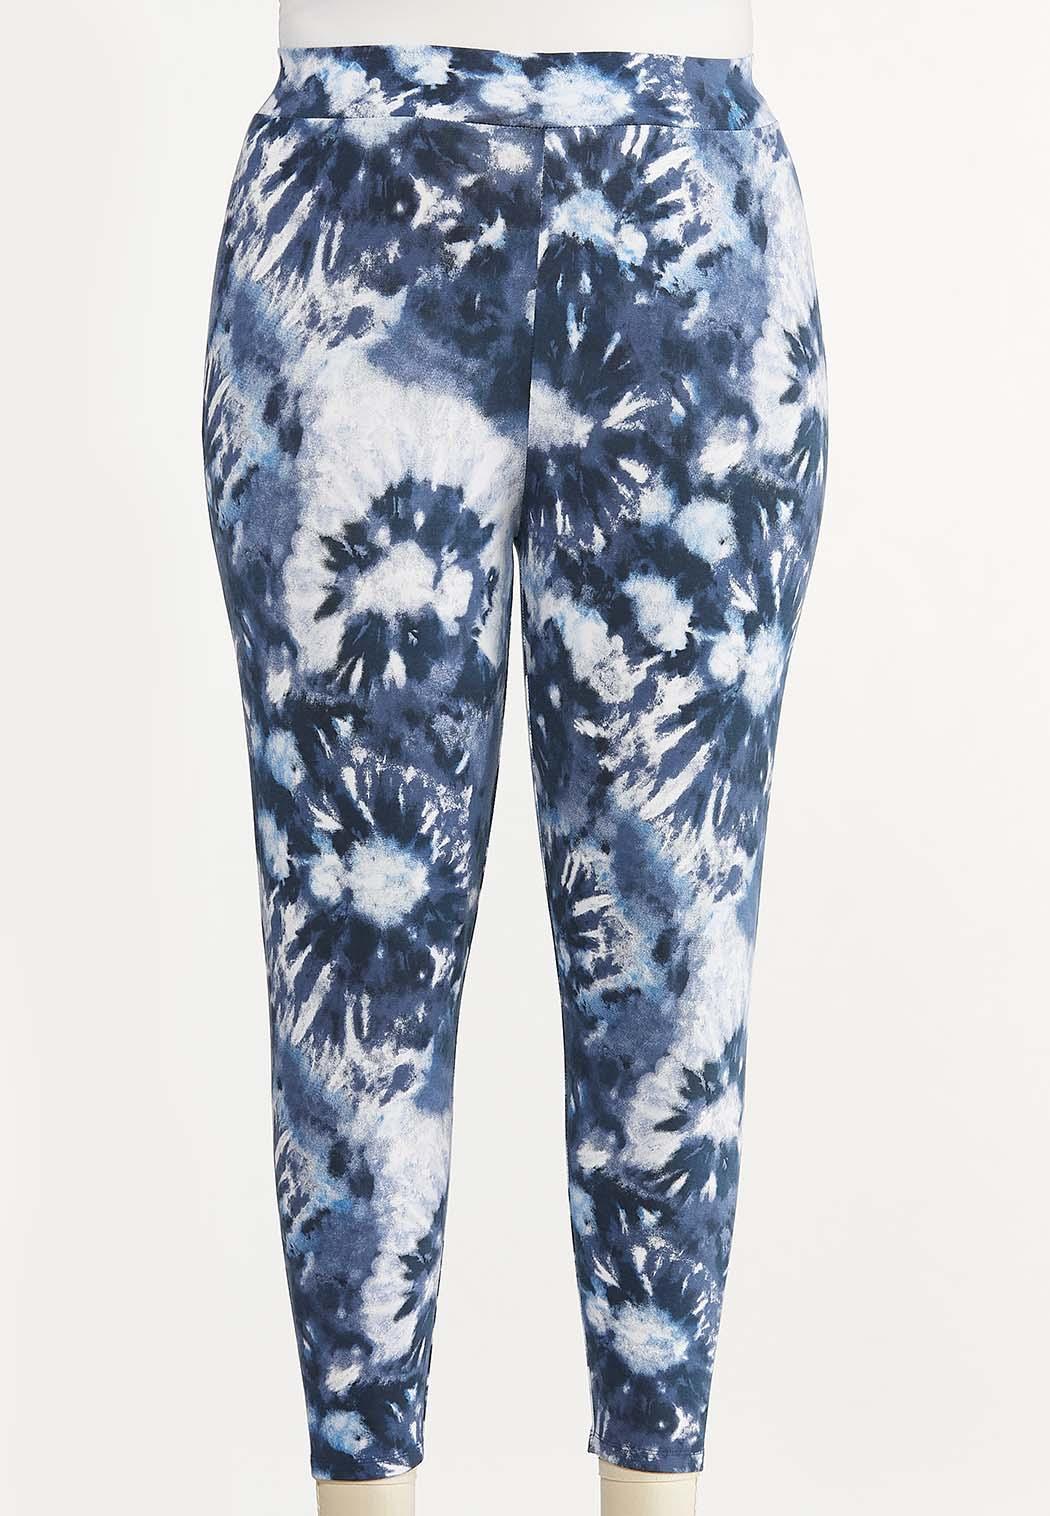 Plus Size Cropped Tie Dye Leggings